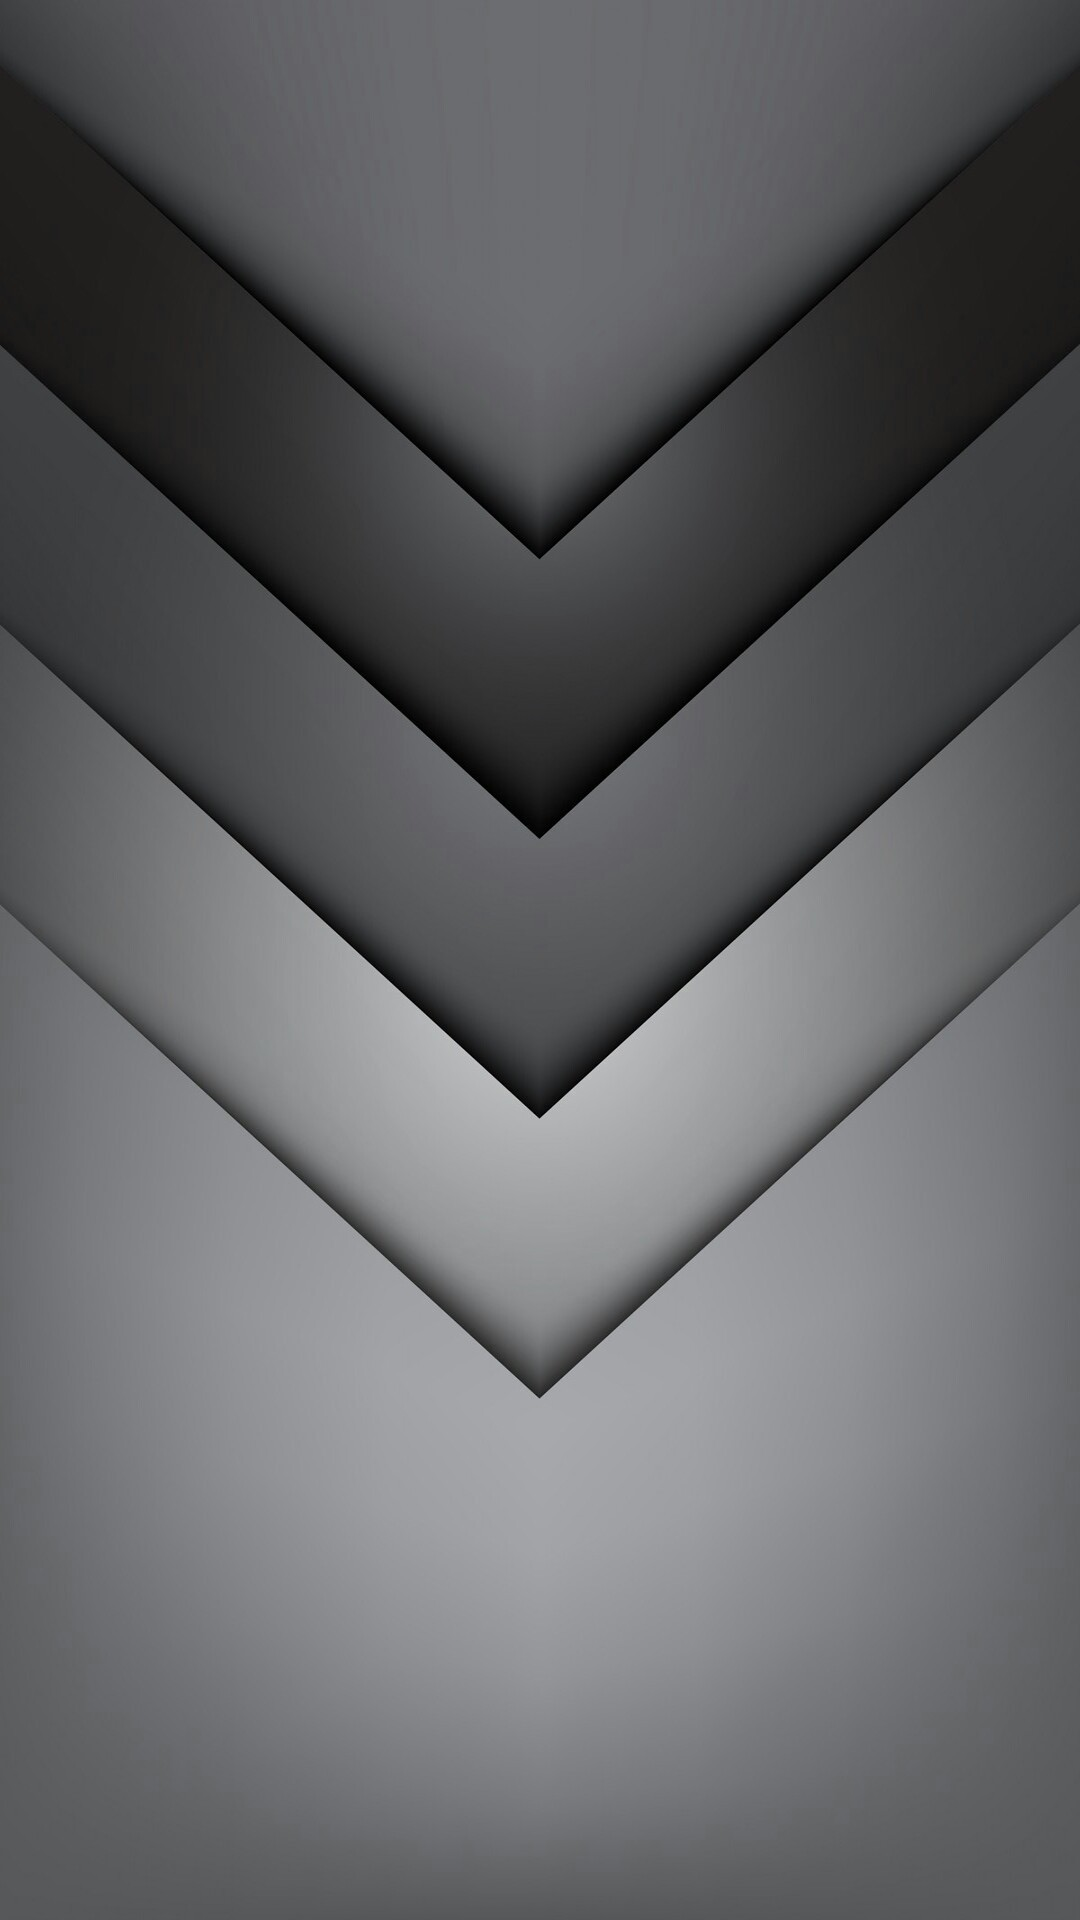 Gradient Grey Chevron Wallpaper